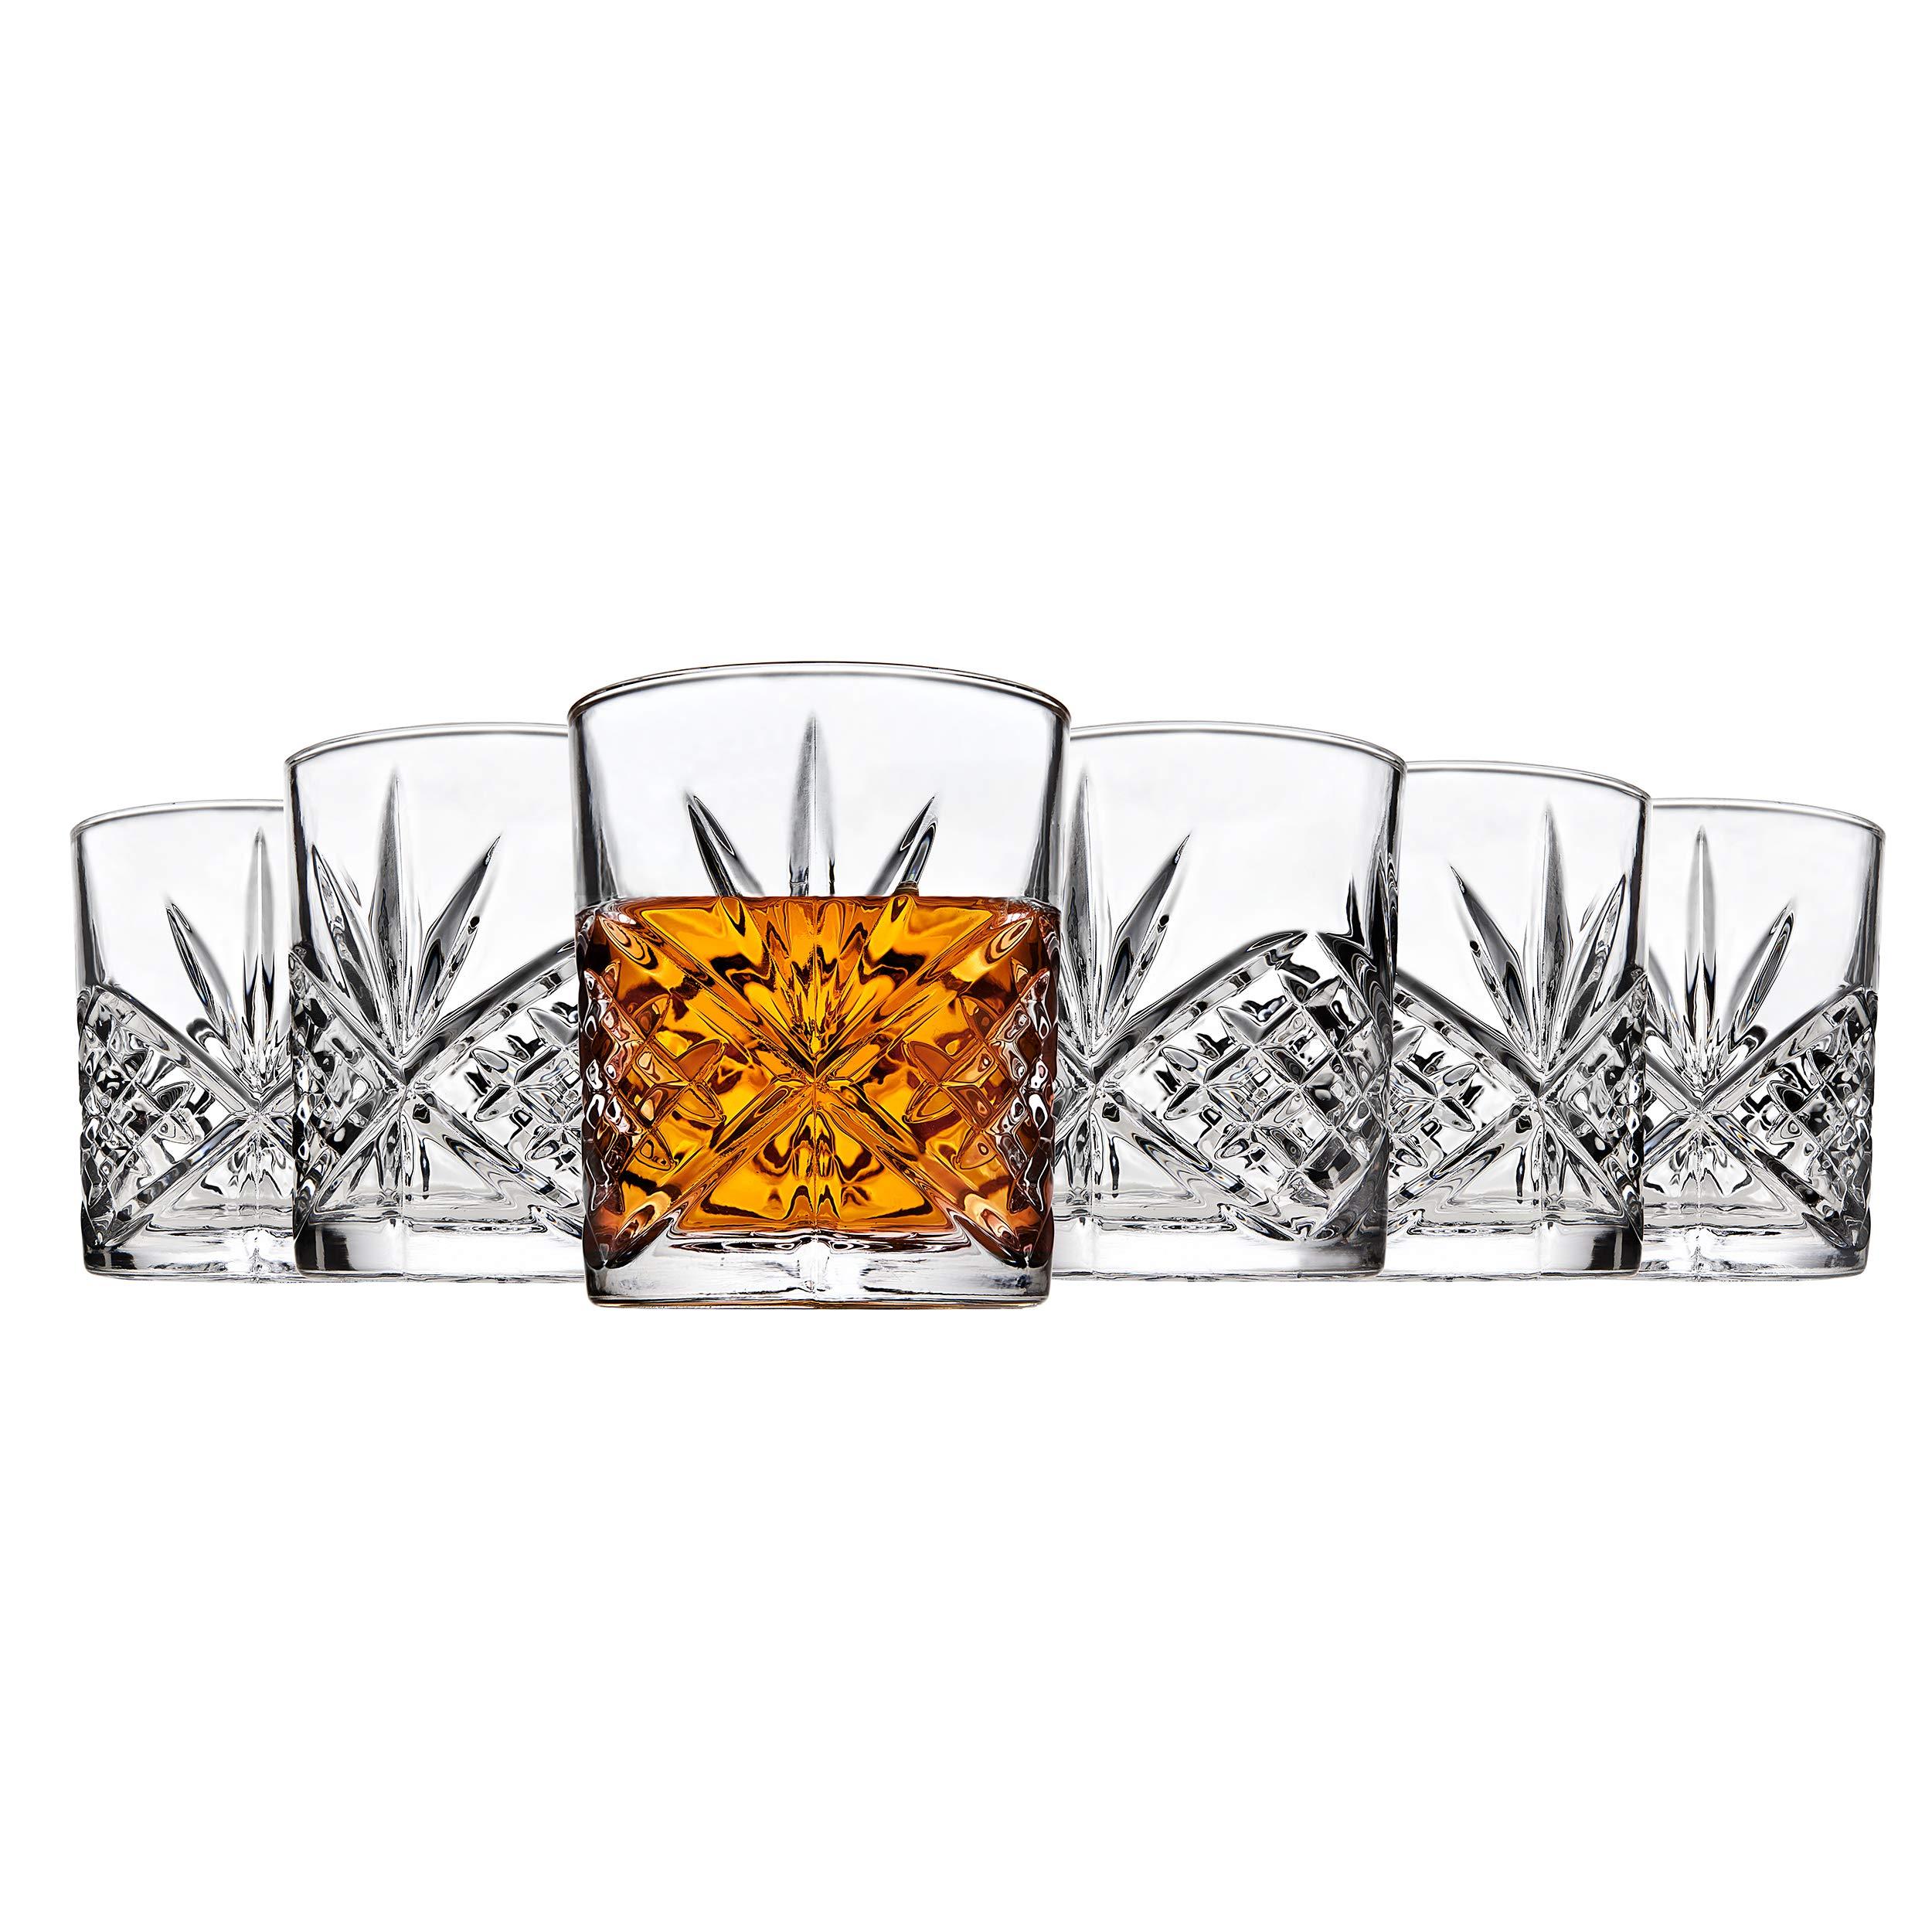 Godinger Dublin Double Old Fashioned Glasses, Set of 6